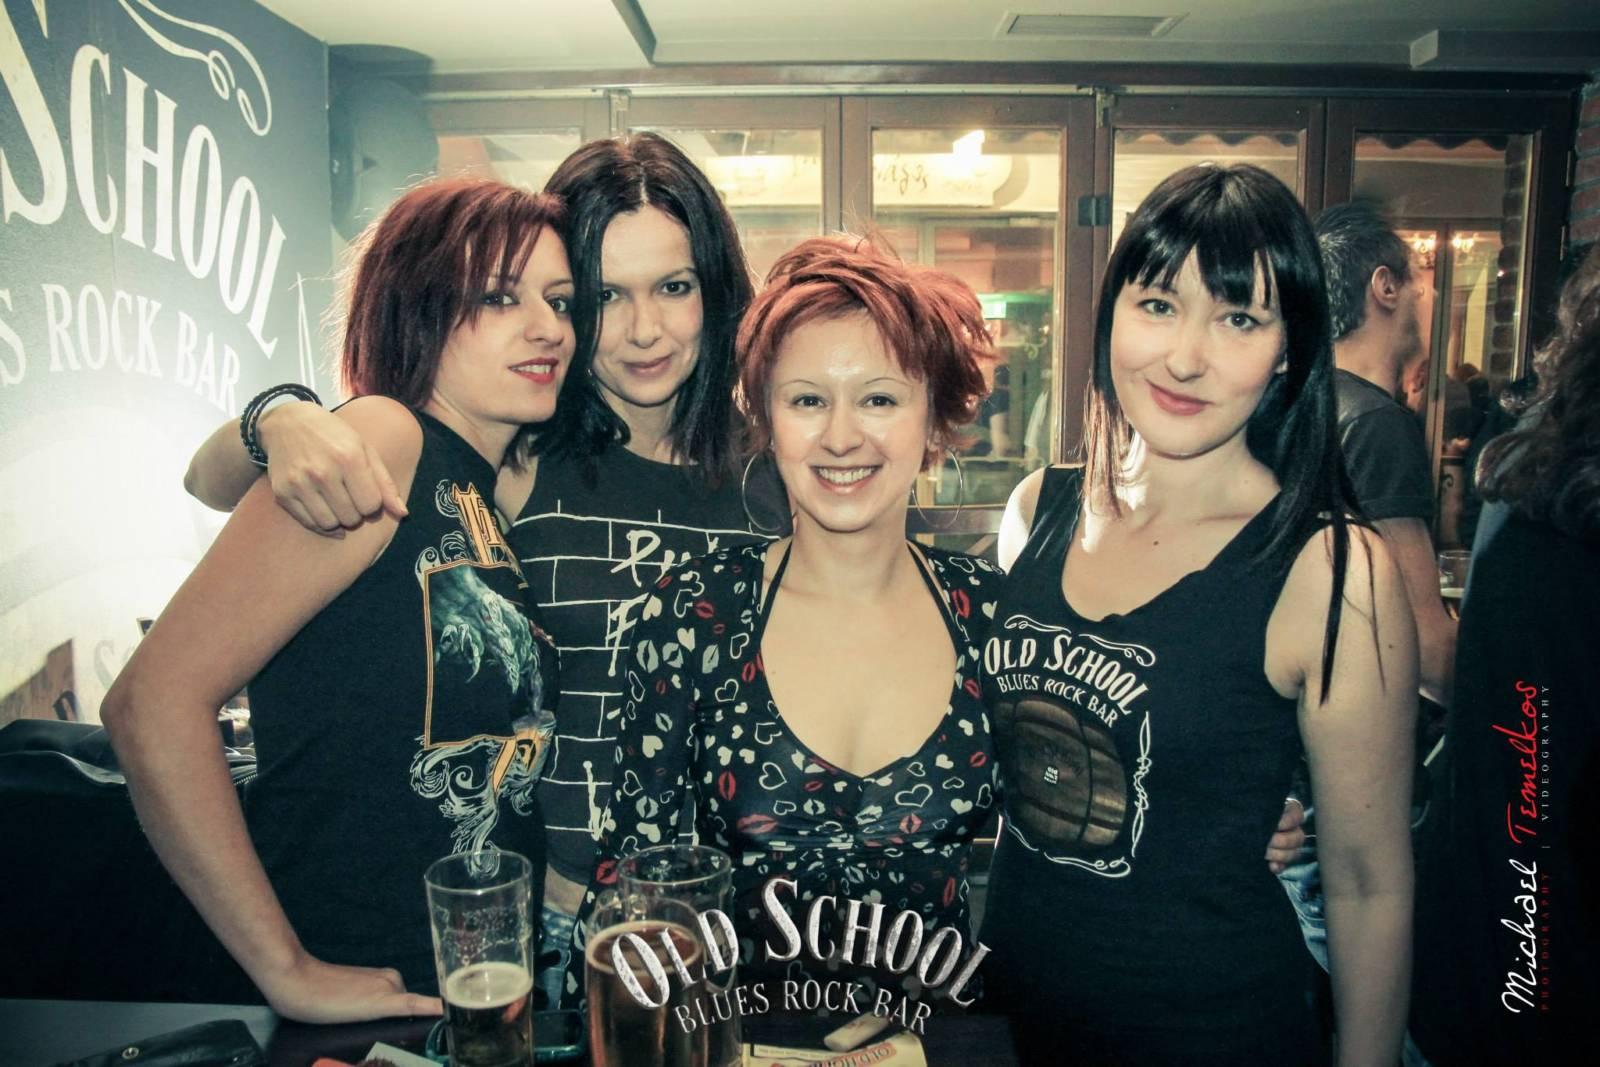 Aυθεντικούς   ροκ ήχους χάρισαν George Gakis & The Troublemakers, την Παρασκευή 21 Νοεμβρίου, στο  Old School Blues Rock Bar στην Κοζάνη